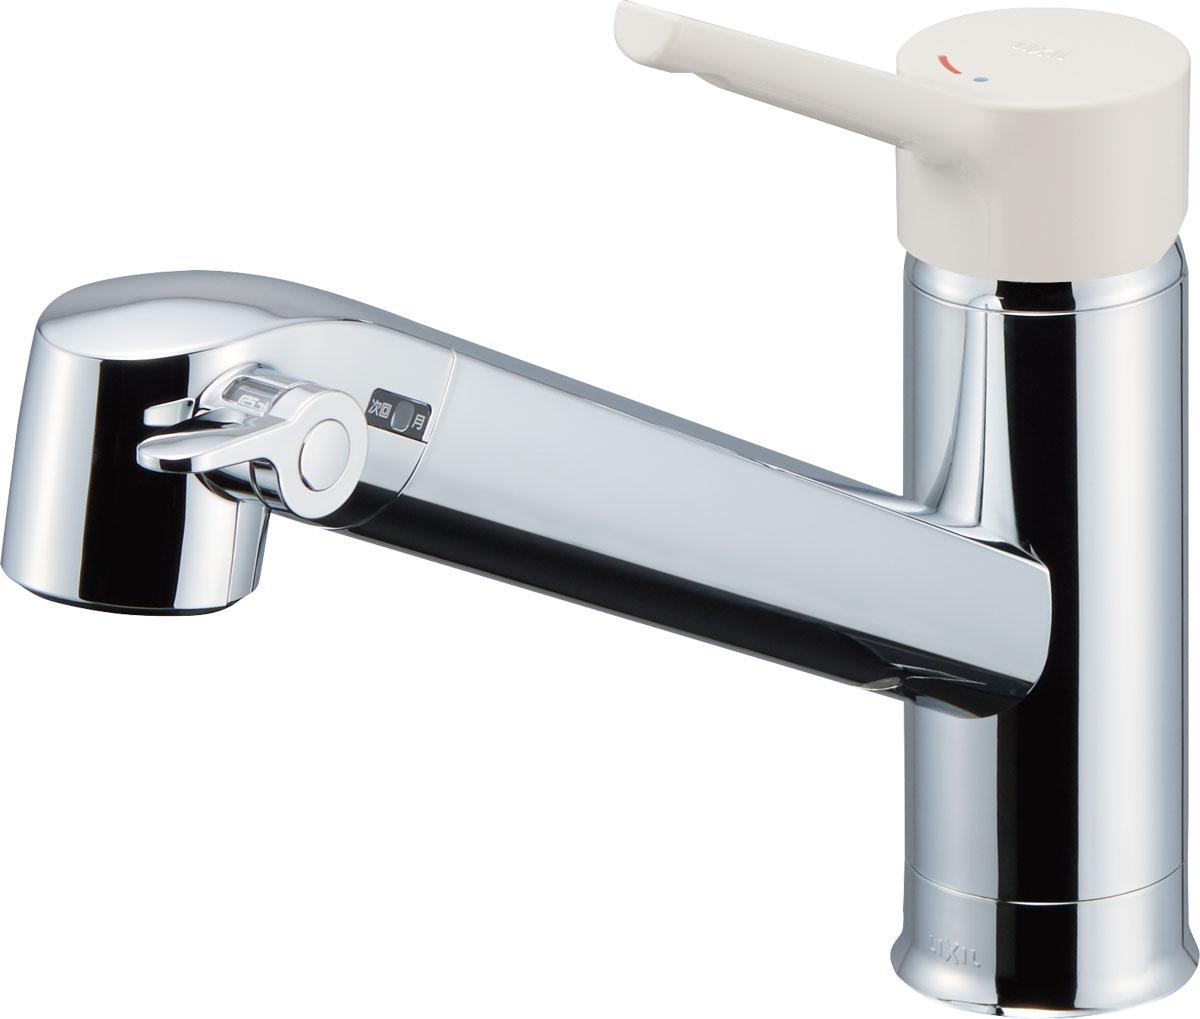 LIXIL INAX オールインワン浄水栓 シングルレバー混合栓 FNタイプ JF-AG442SYX(JW) JF-AG442SYXN(JW)